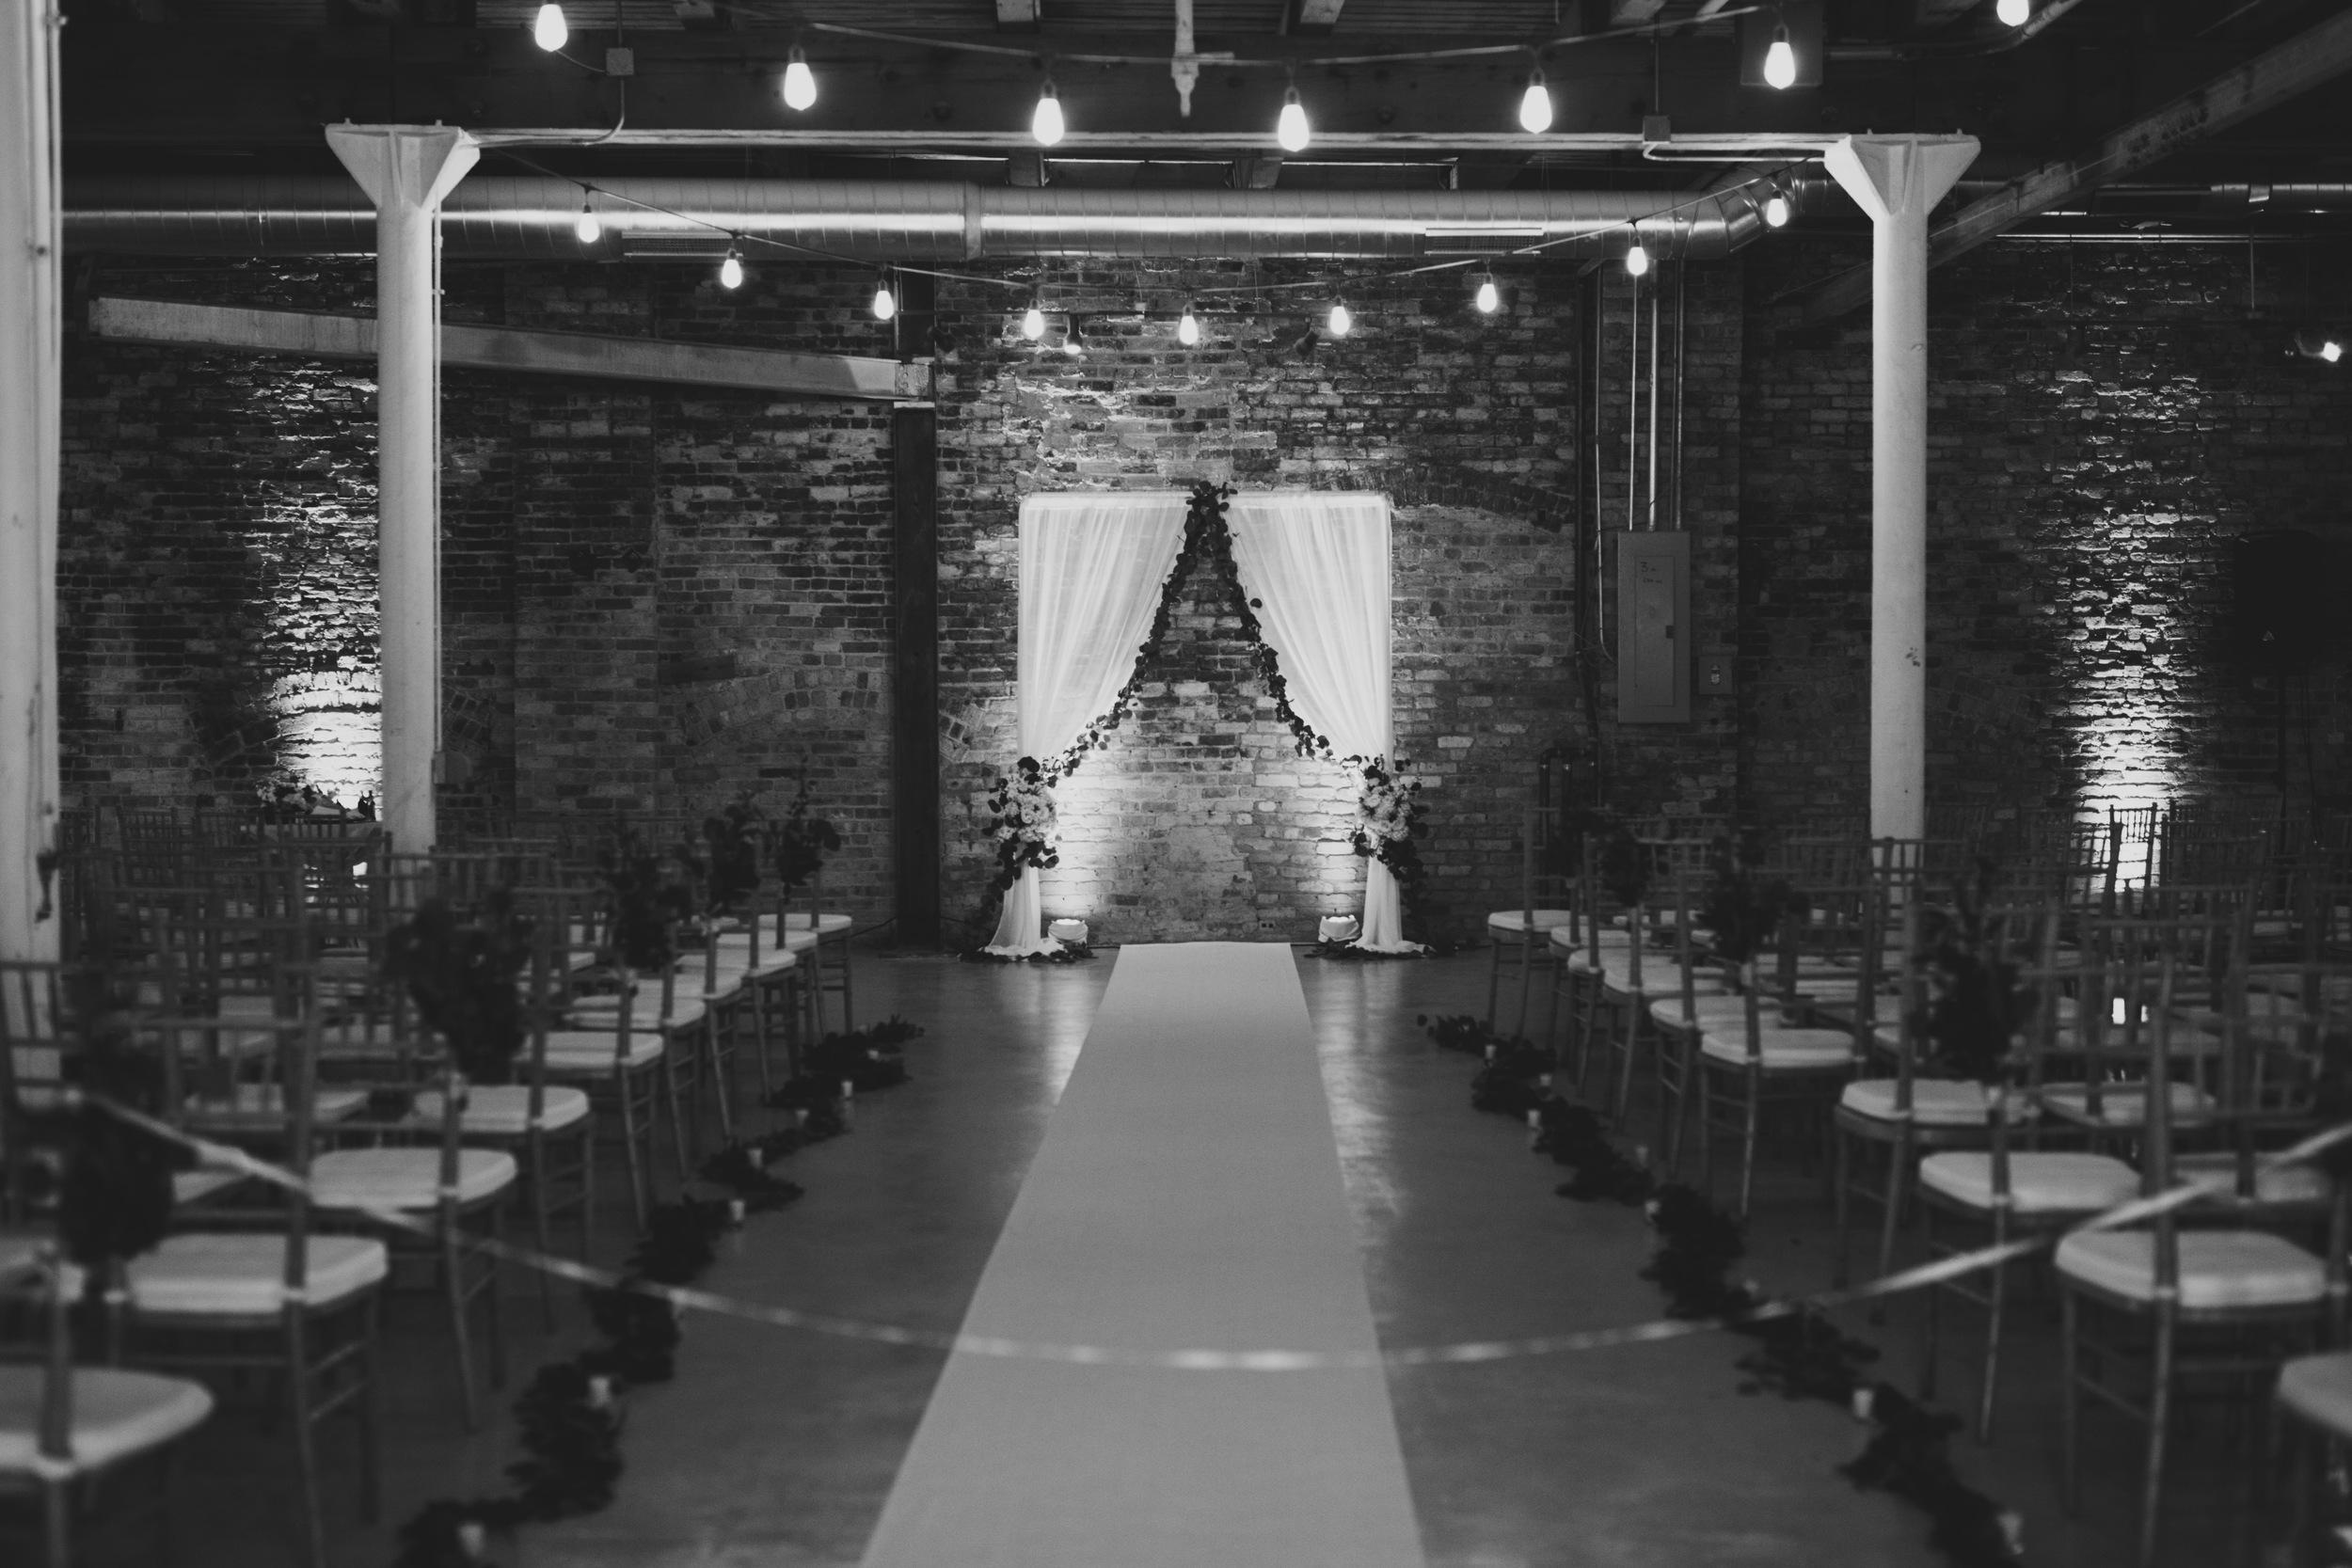 kenmare loft wedding ceremony